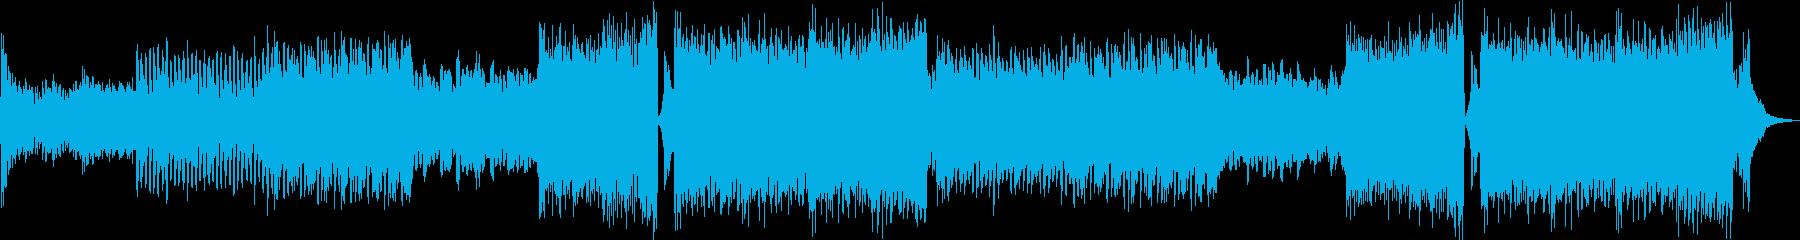 EDM・疾走感・切ない・ドラマチックの再生済みの波形